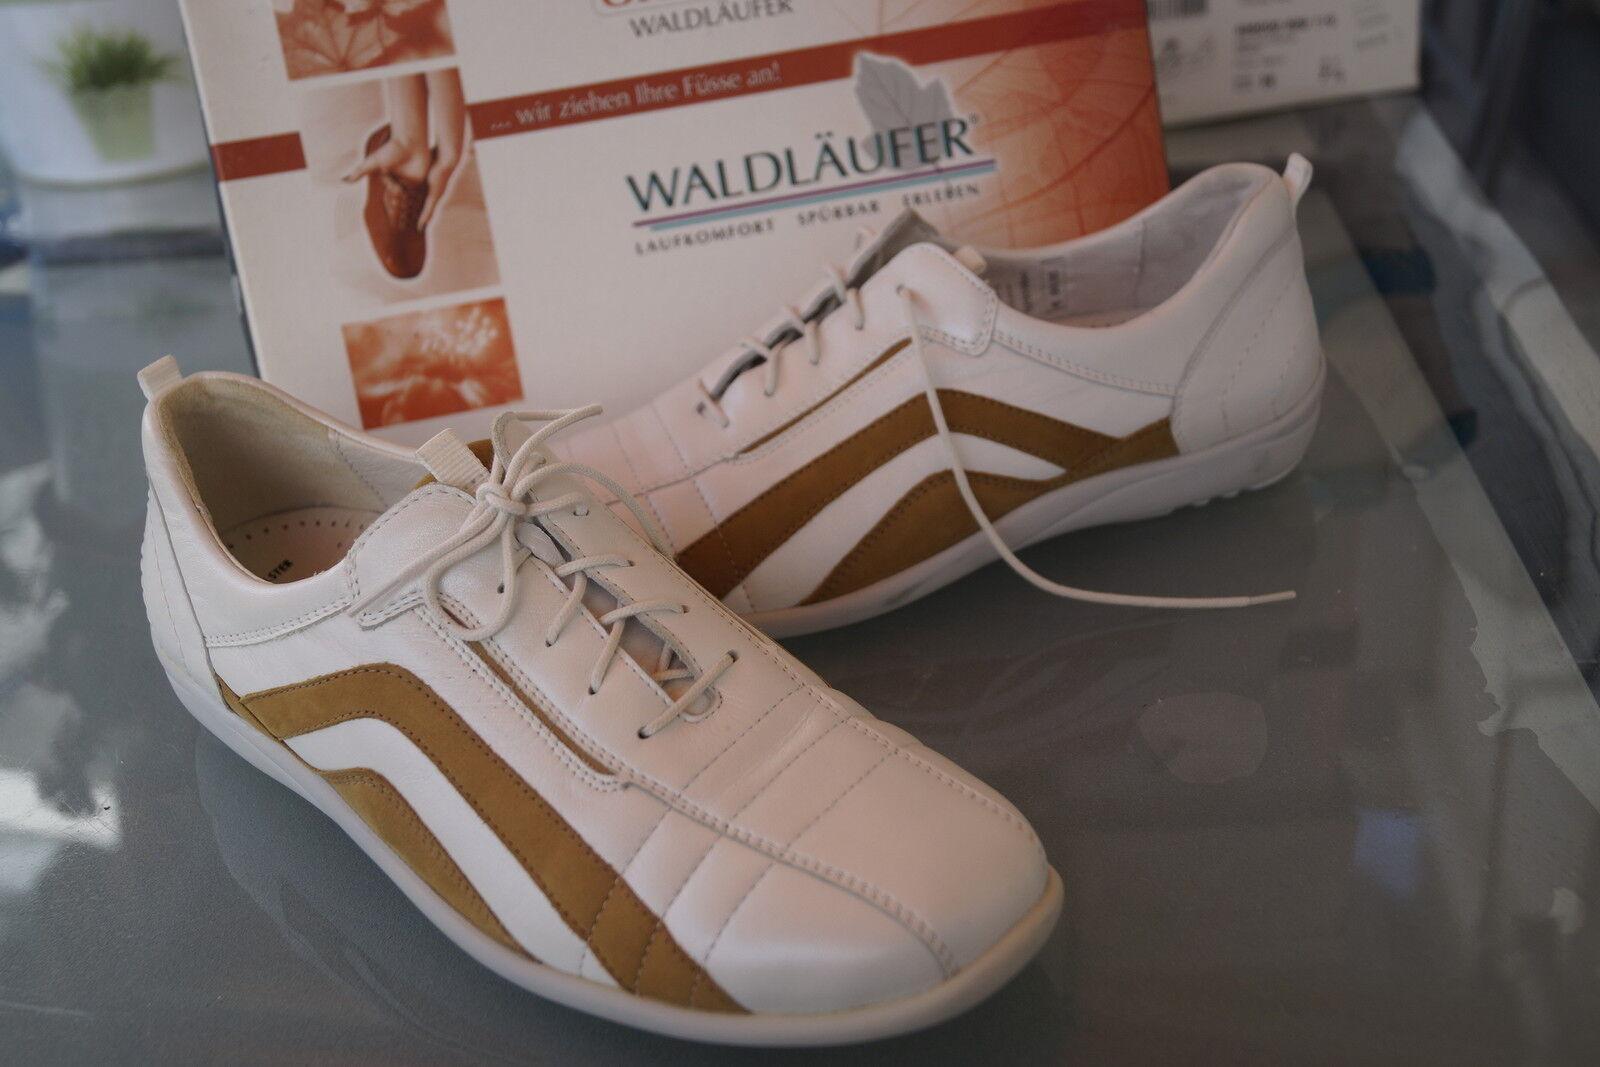 Bosque Bosque Bosque alfil Gisa señora Comfort zapatos mocasines schnürzapatos con depósitos talla 5 g 38  gran venta